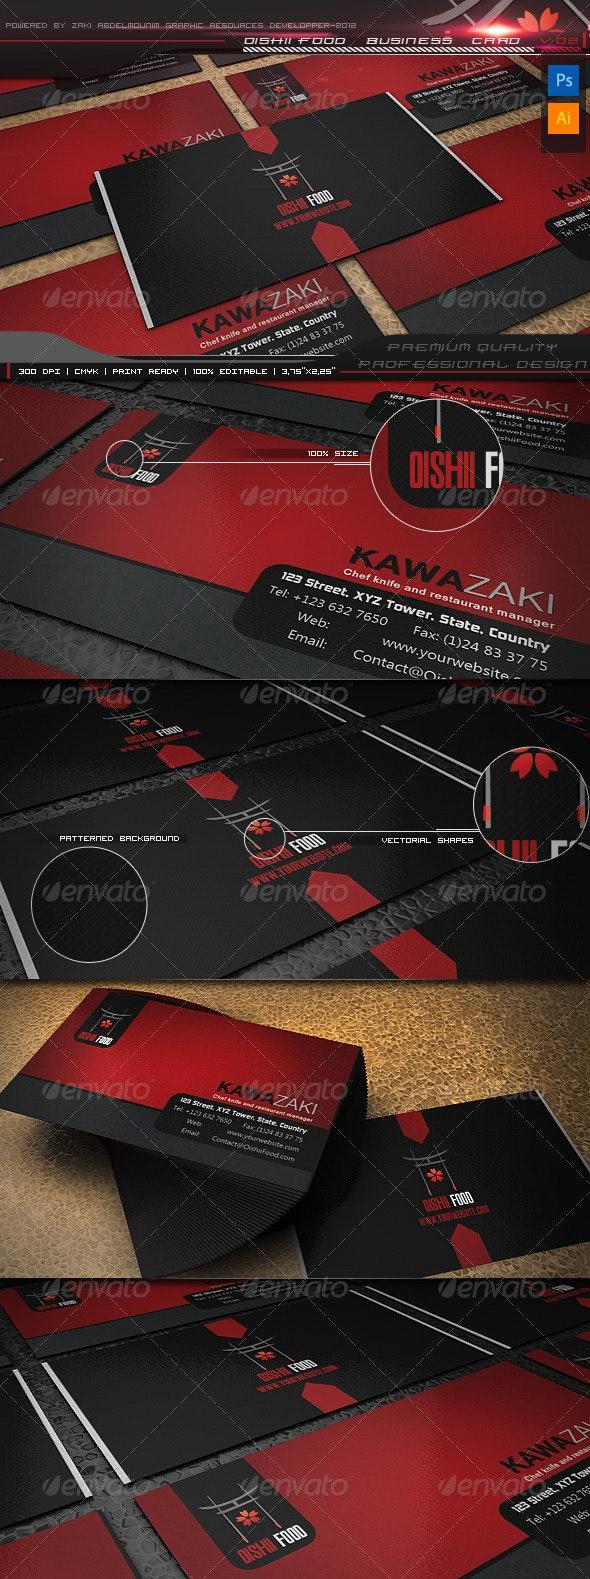 Oishii Food business card v2 - Business Cards Print Templates